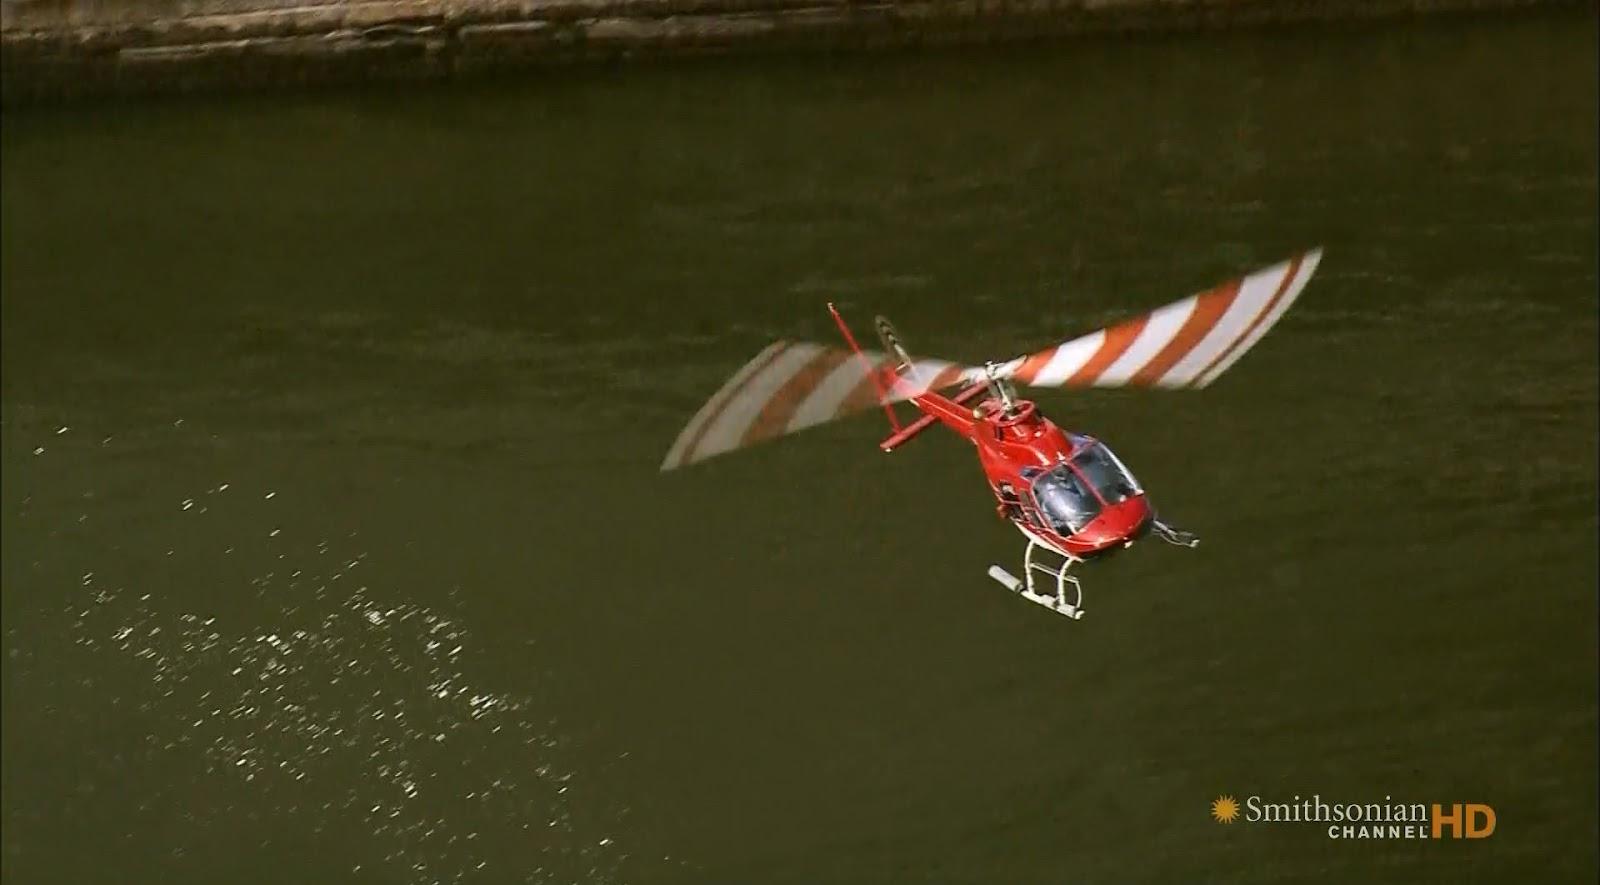 http://4.bp.blogspot.com/-_owQXKzVQto/T7LDj5XrJxI/AAAAAAAAEvI/vMlXvIyhgUc/s1600/Aerial-America---New-York-weee.jpg